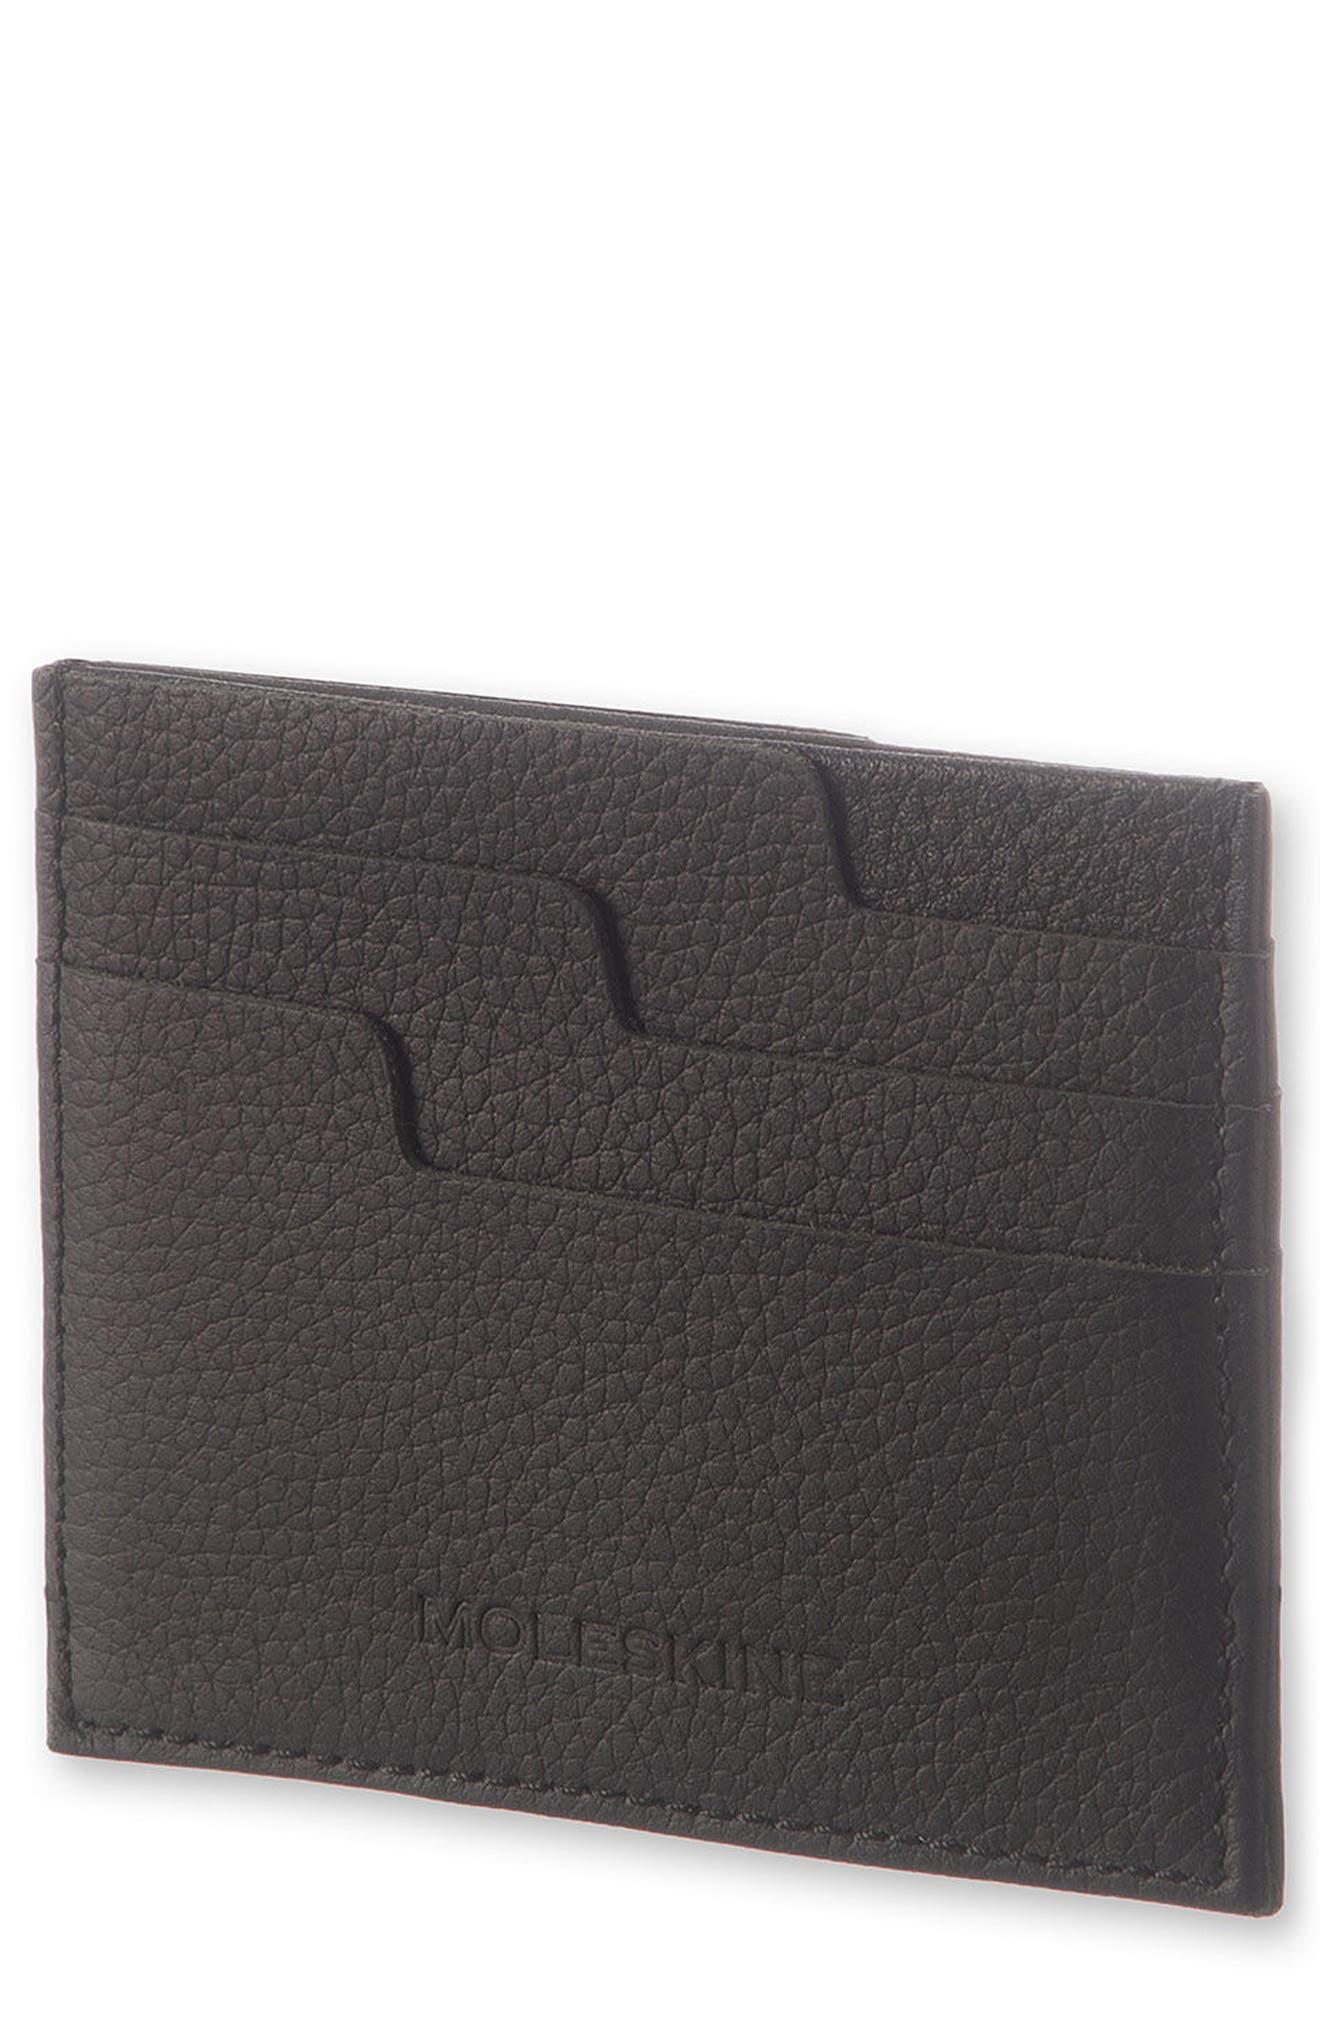 Main Image - Moleskin Lineage Leather Card Case